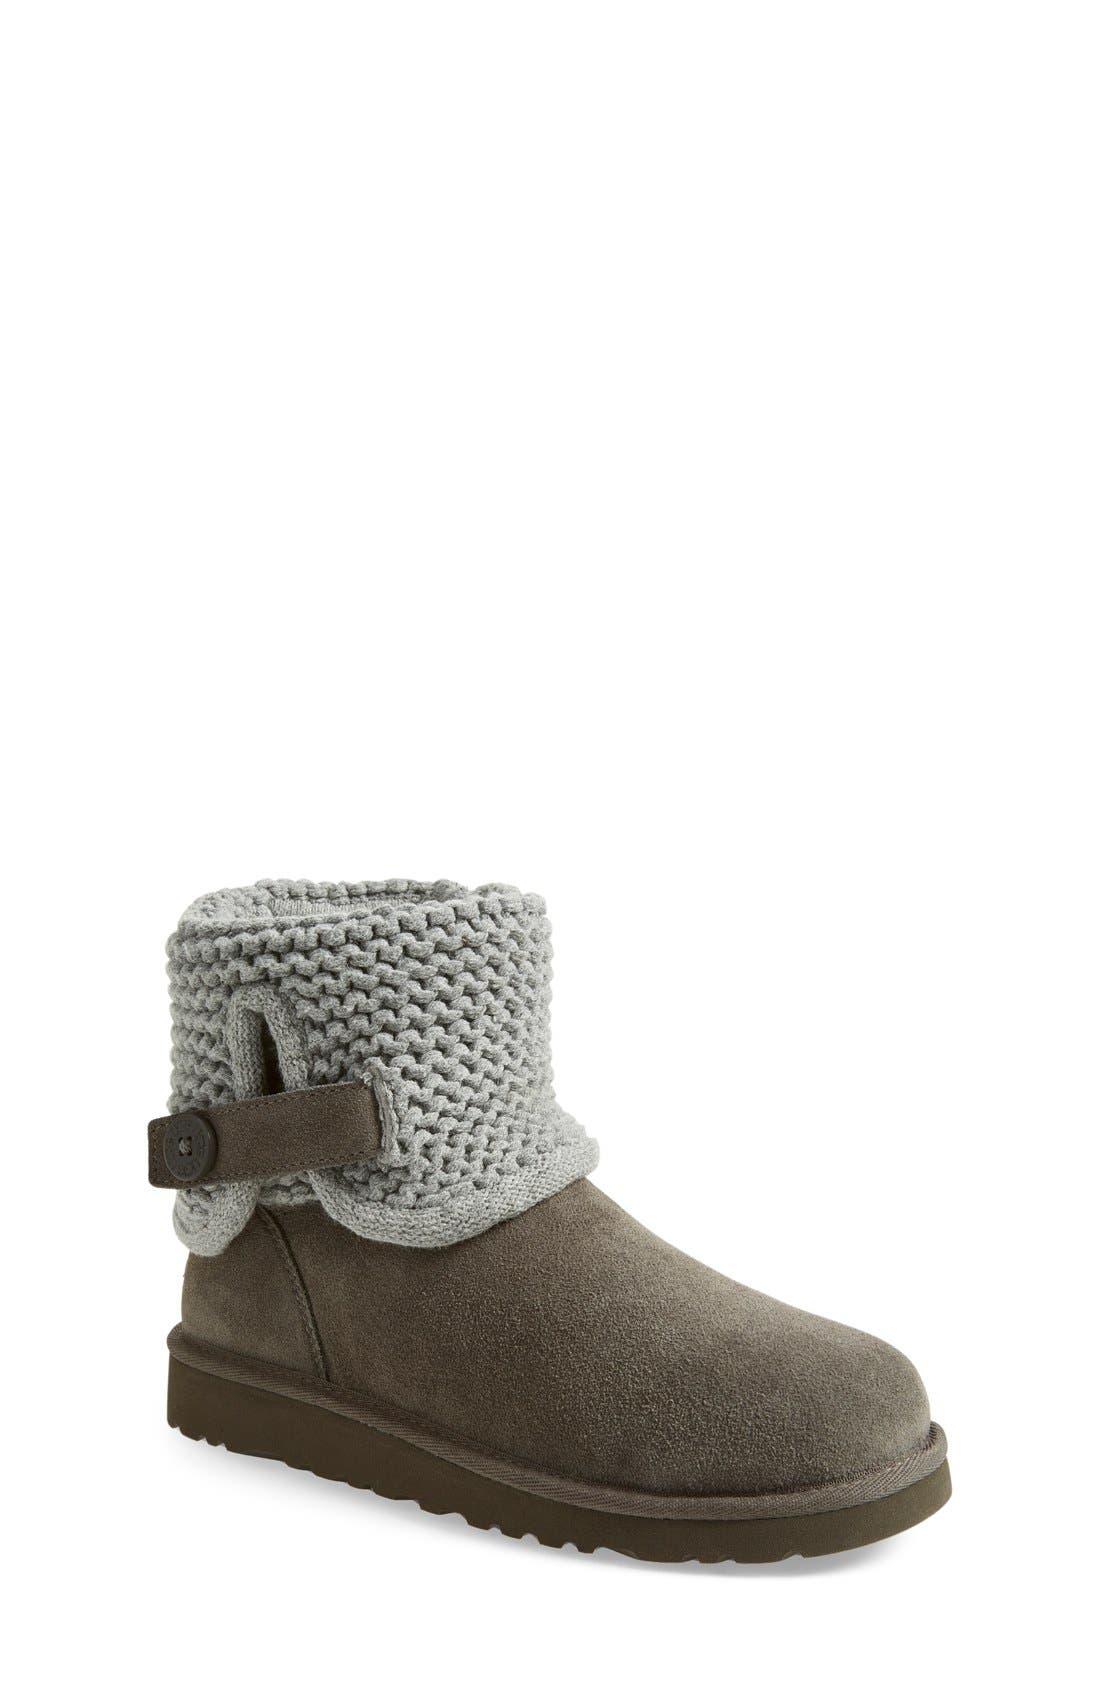 Alternate Image 1 Selected - UGG® Darrah Purl Knit Cuff Boot (Little Kid & Big Kid)